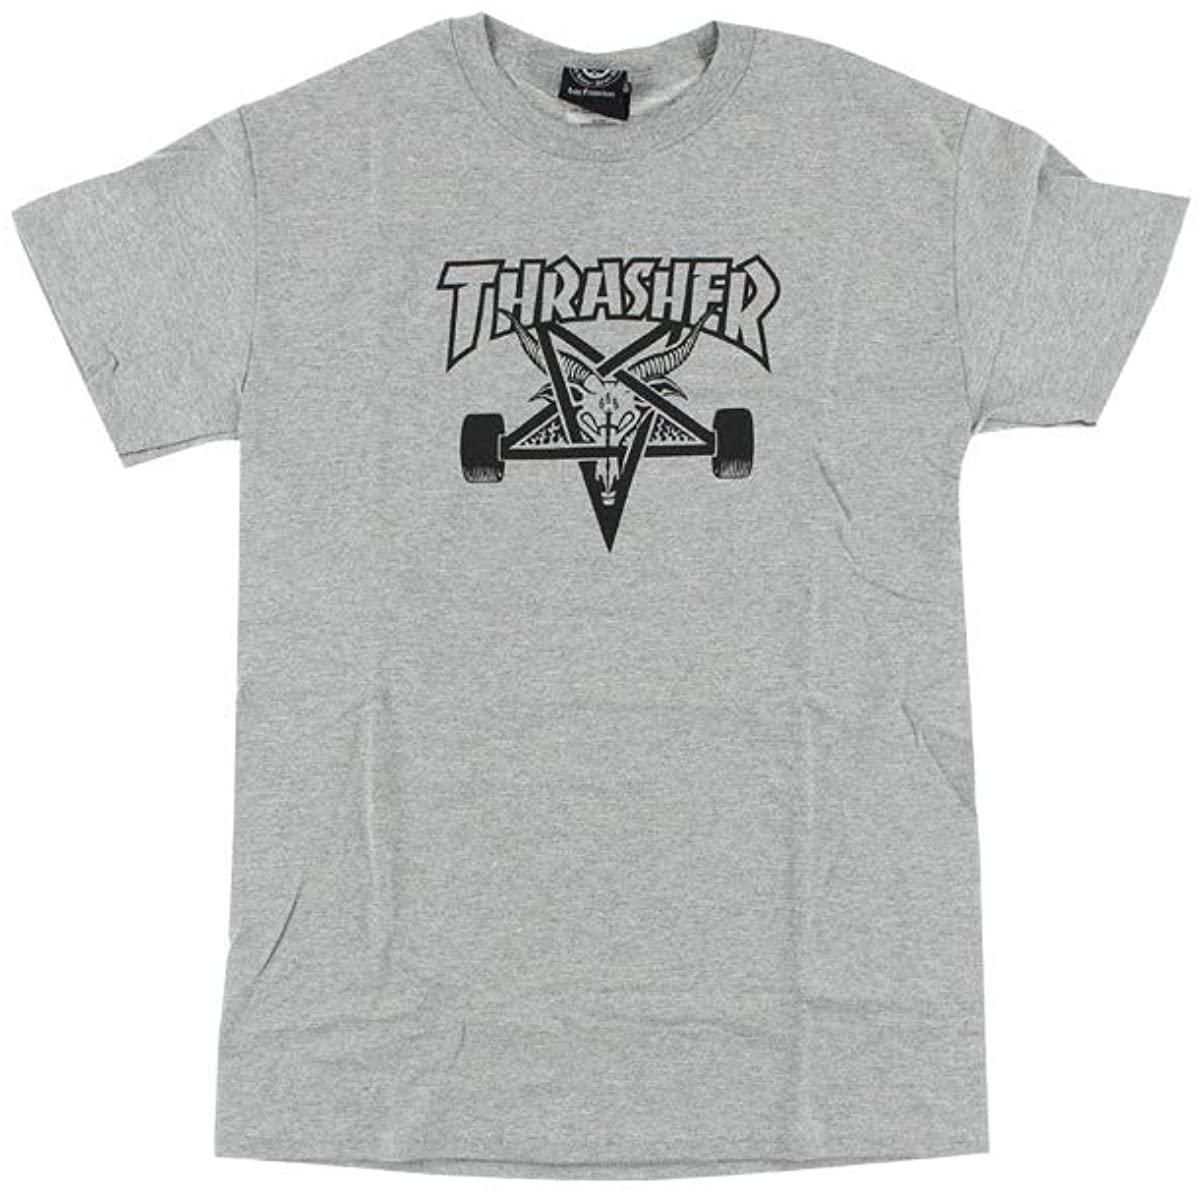 Thrasher Magazine Sk8goat Grey Men's Short Sleeve T-Shirt - Medium